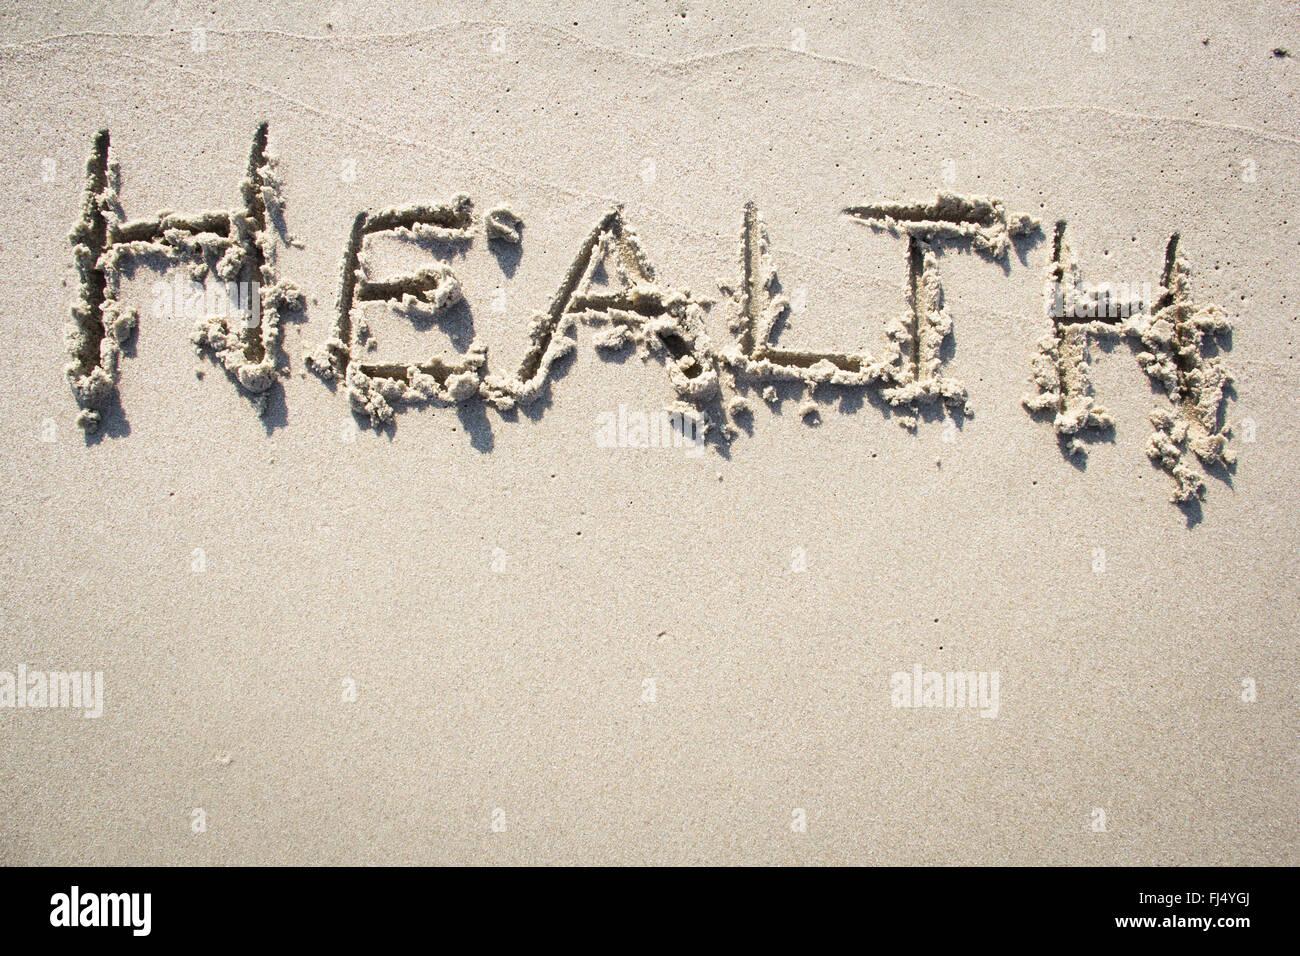 'Health' written in sand - Stock Image